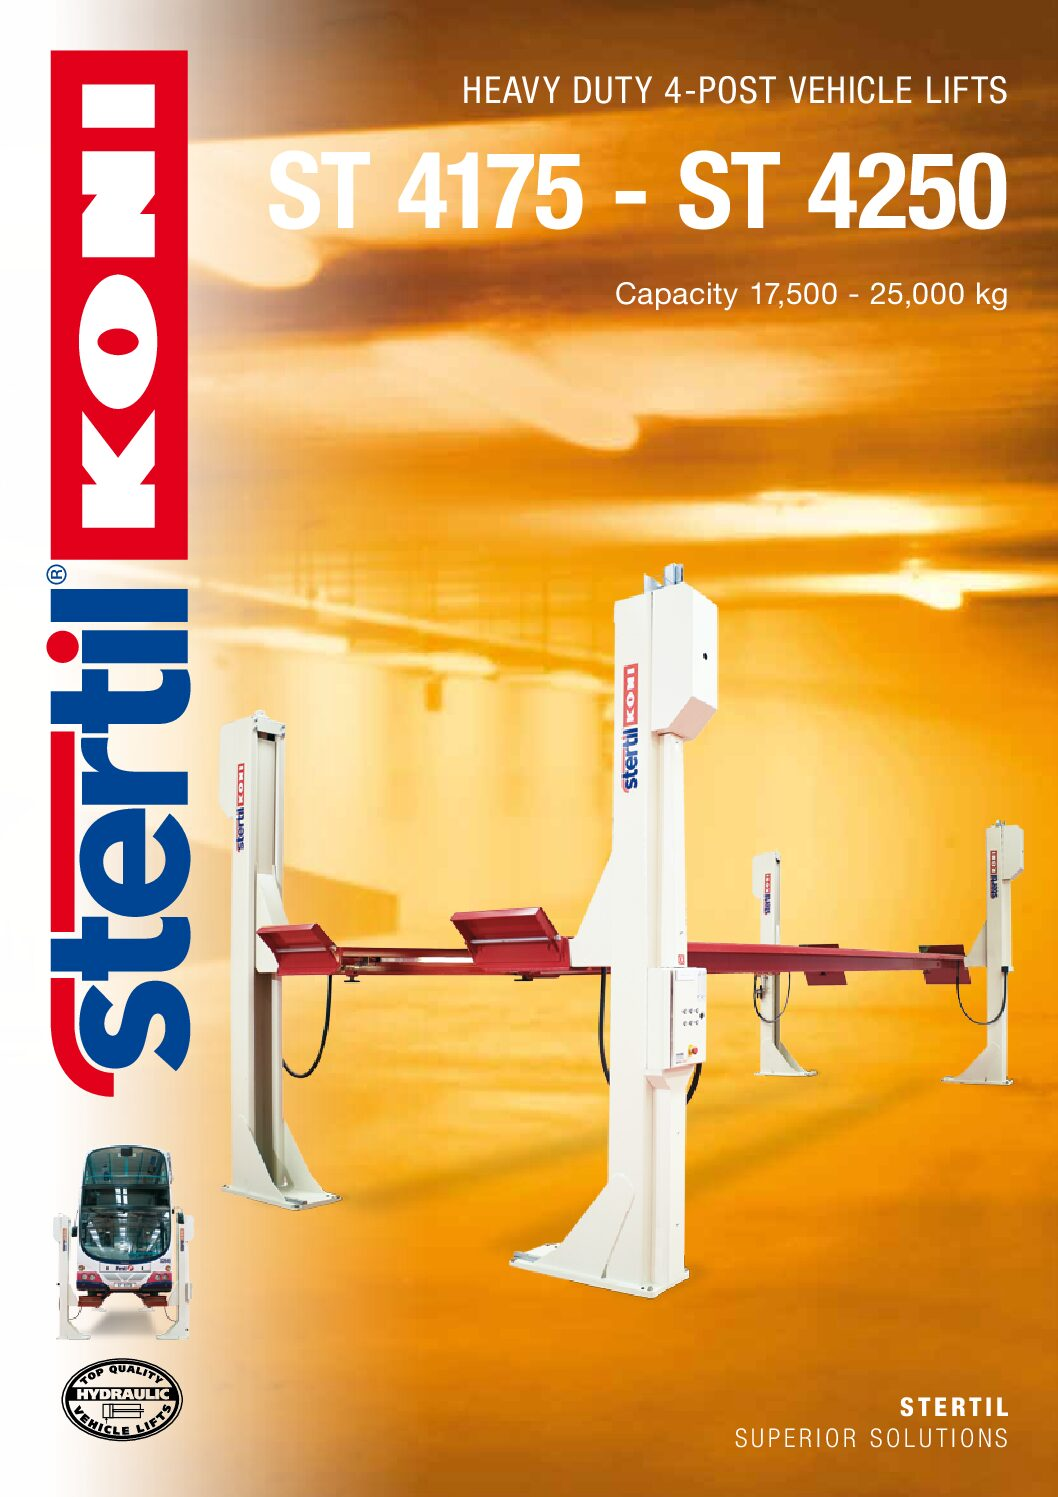 Stertil-Koni: ST 4175 and ST 4250 – GB Version